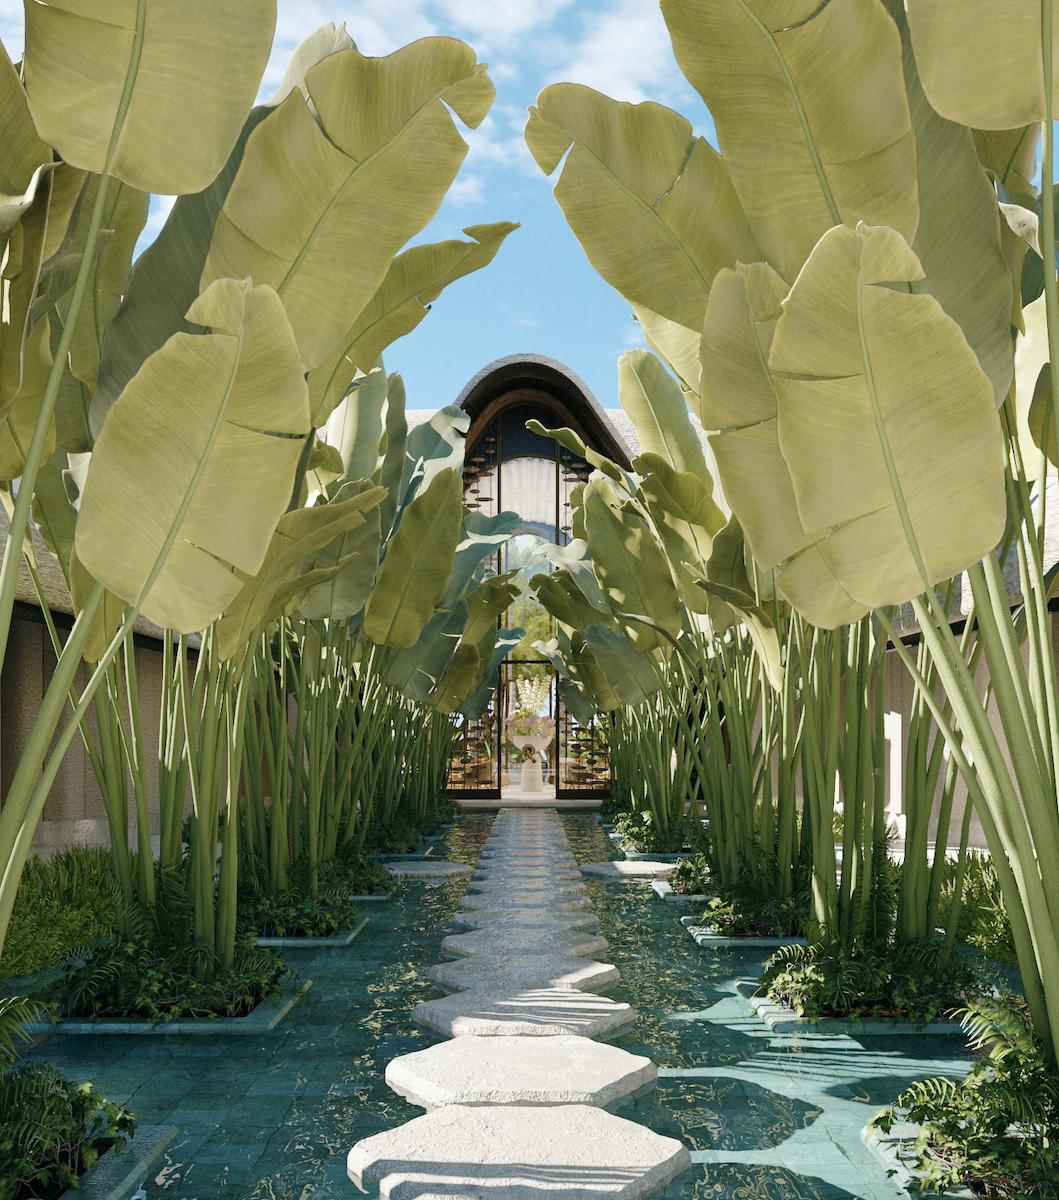 Joali Being: Wellbeing auf naturnaher Malediven-Insel mit biophilem Design